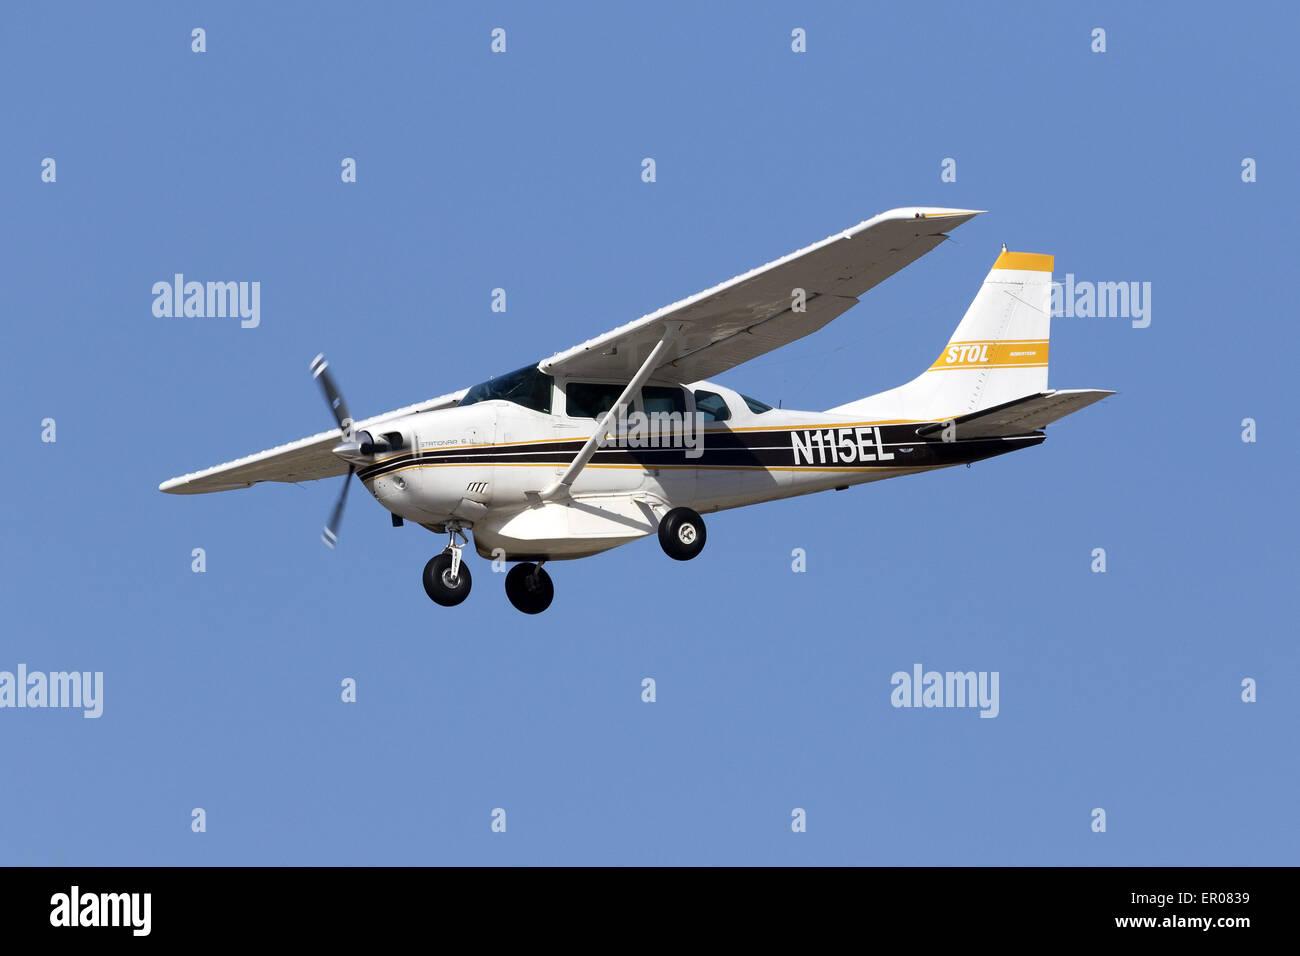 Cessna 206 on finals runway 31 - Stock Image